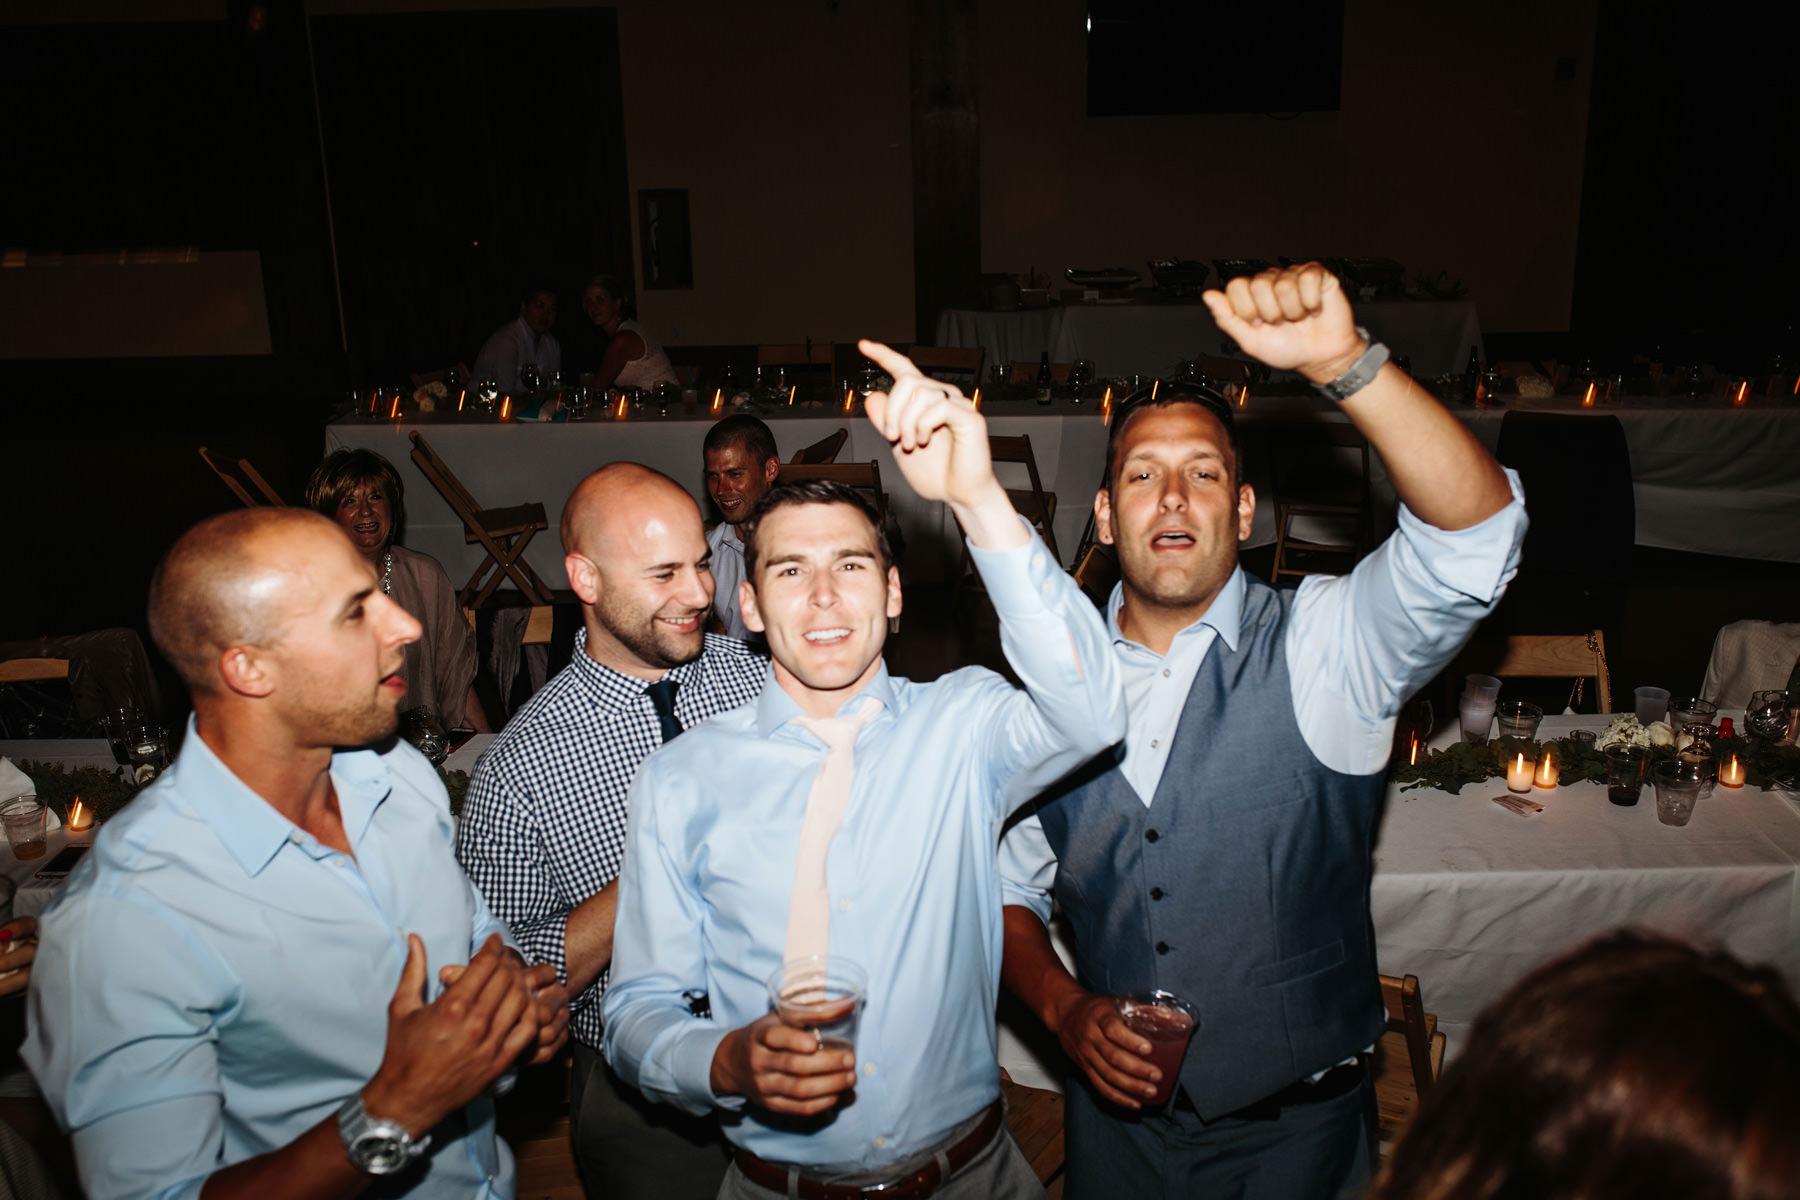 Vail Colorado Wedding Deck_ Kindling Wedding Photography93.JPG